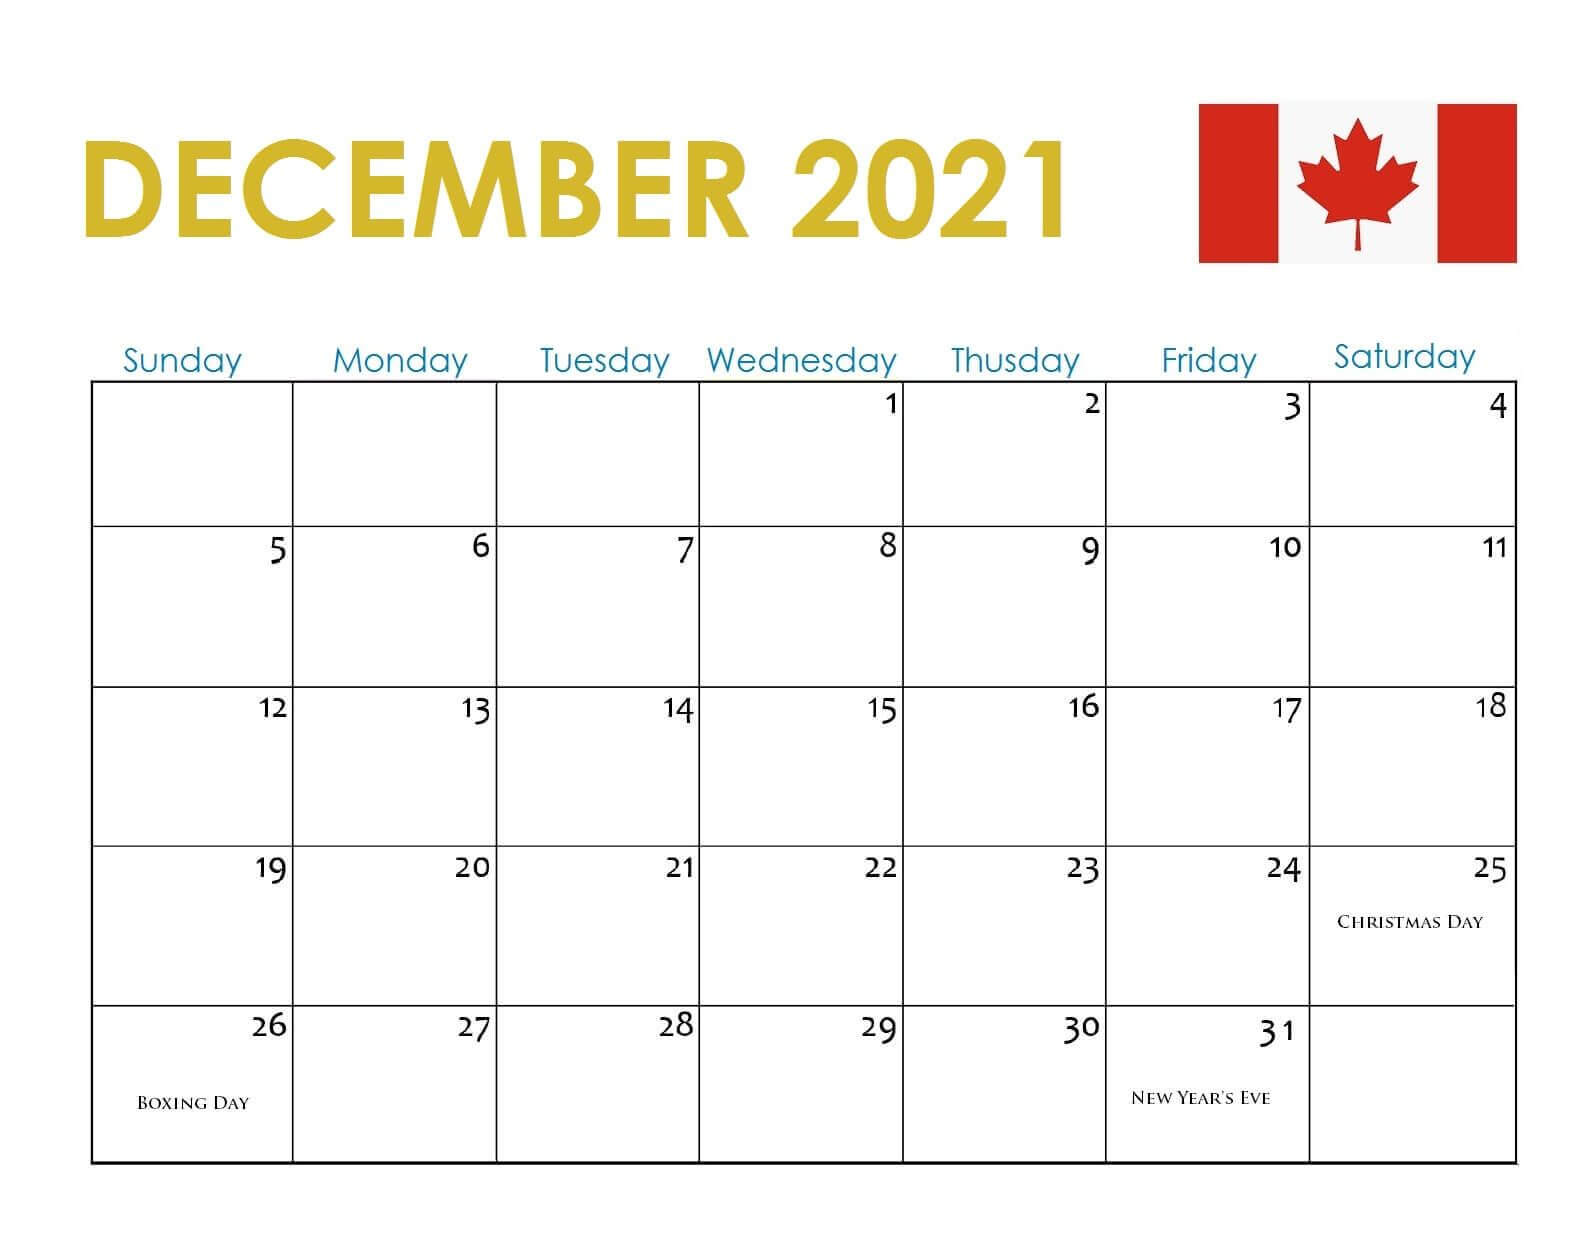 December 2021 Calendar with Holidays Canada